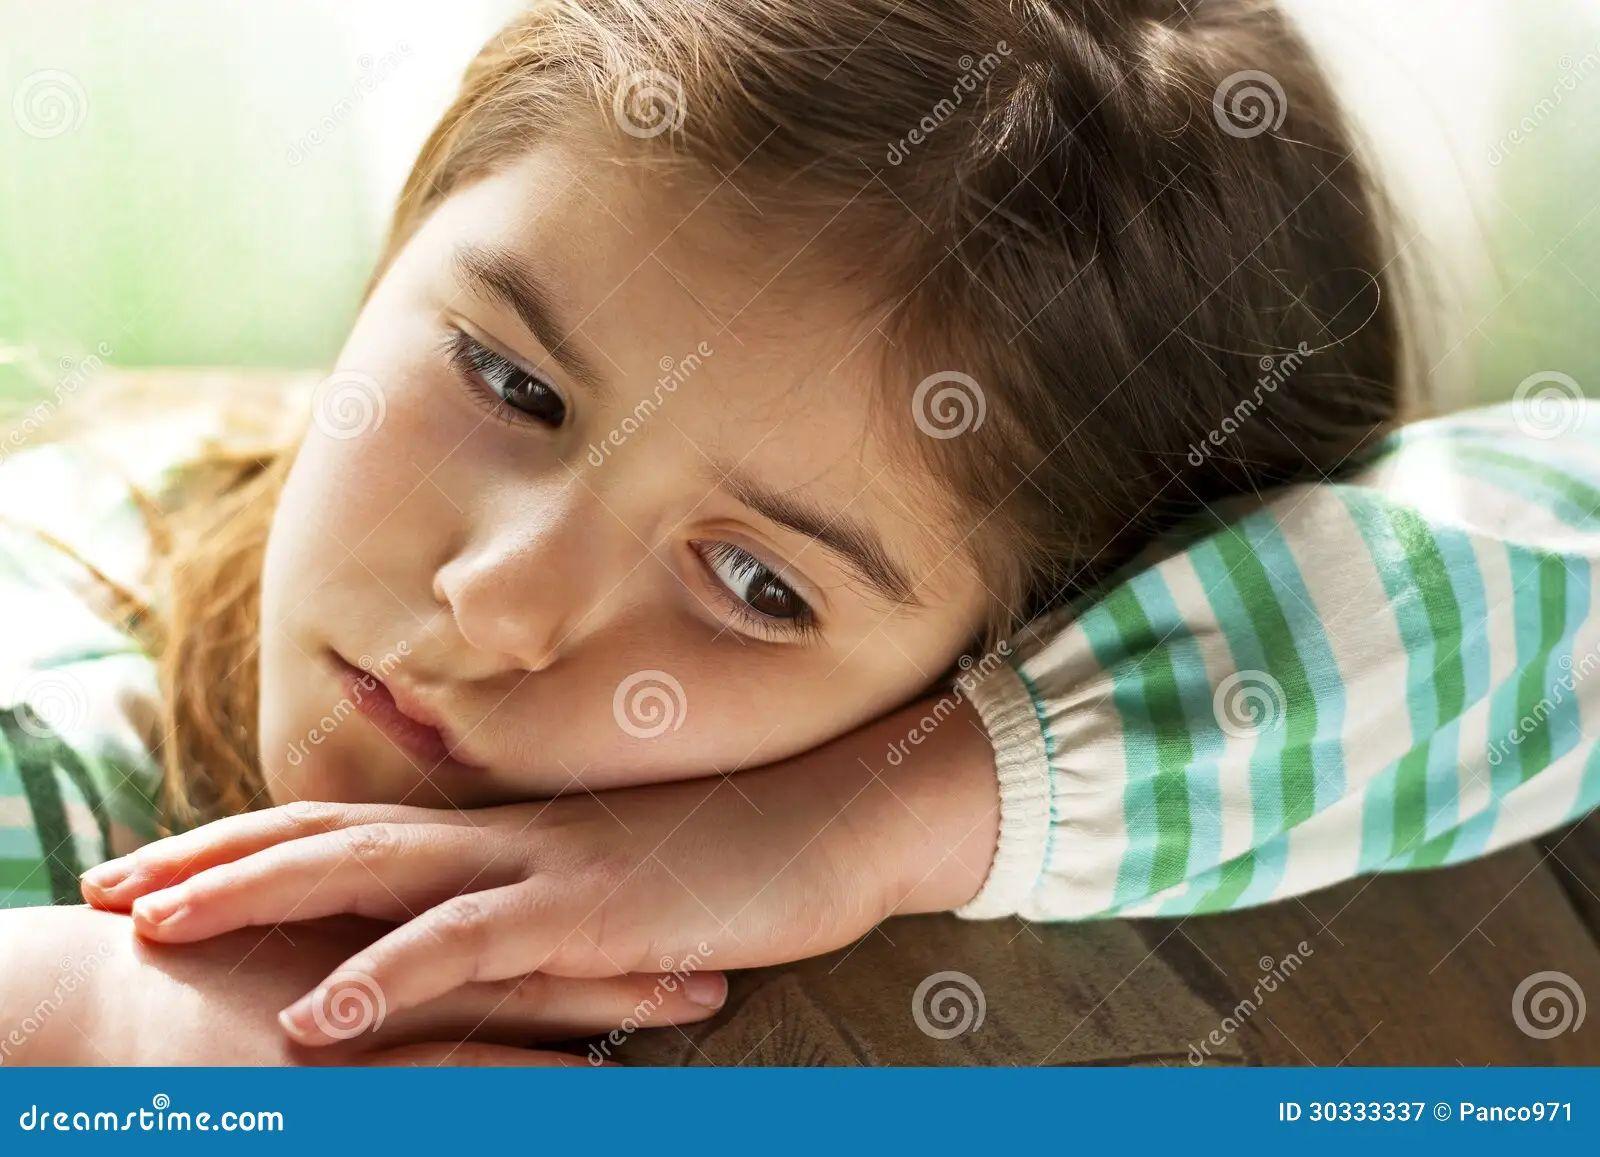 sad child royalty free stock photography